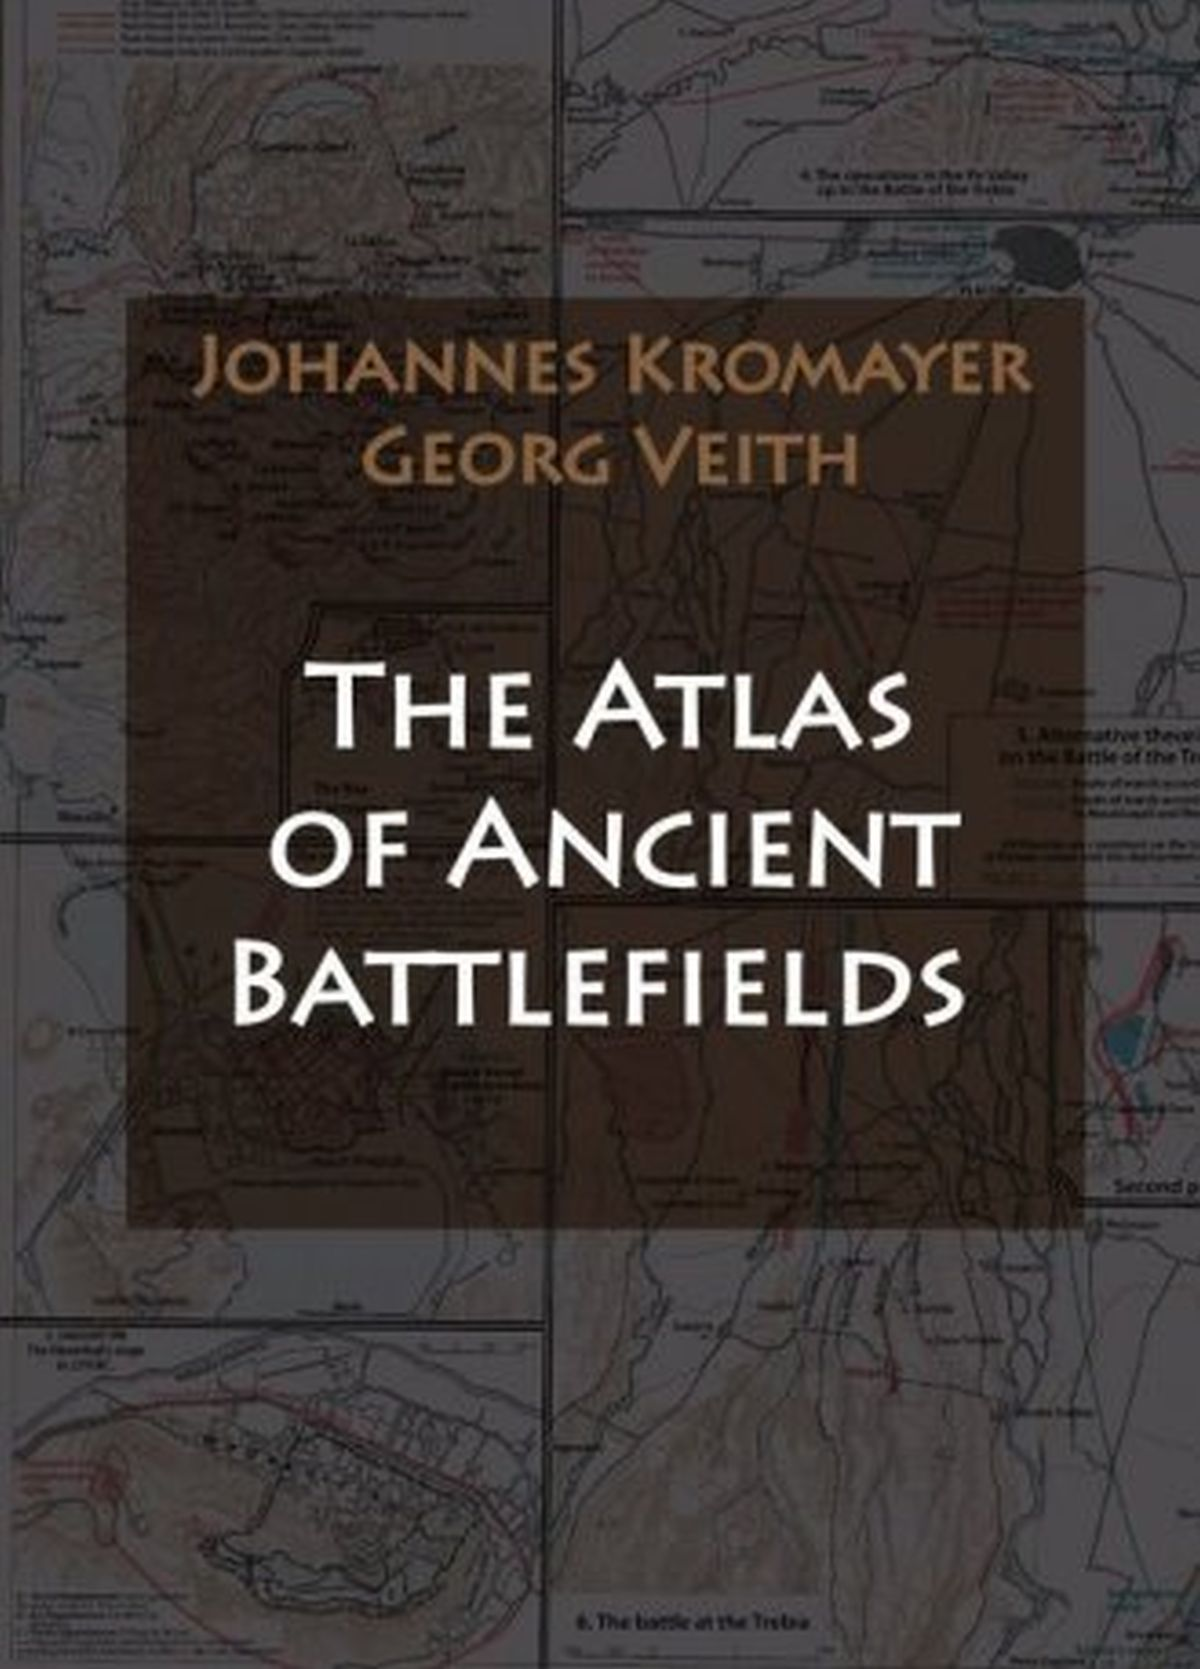 The Atlas of Ancient Battlefields